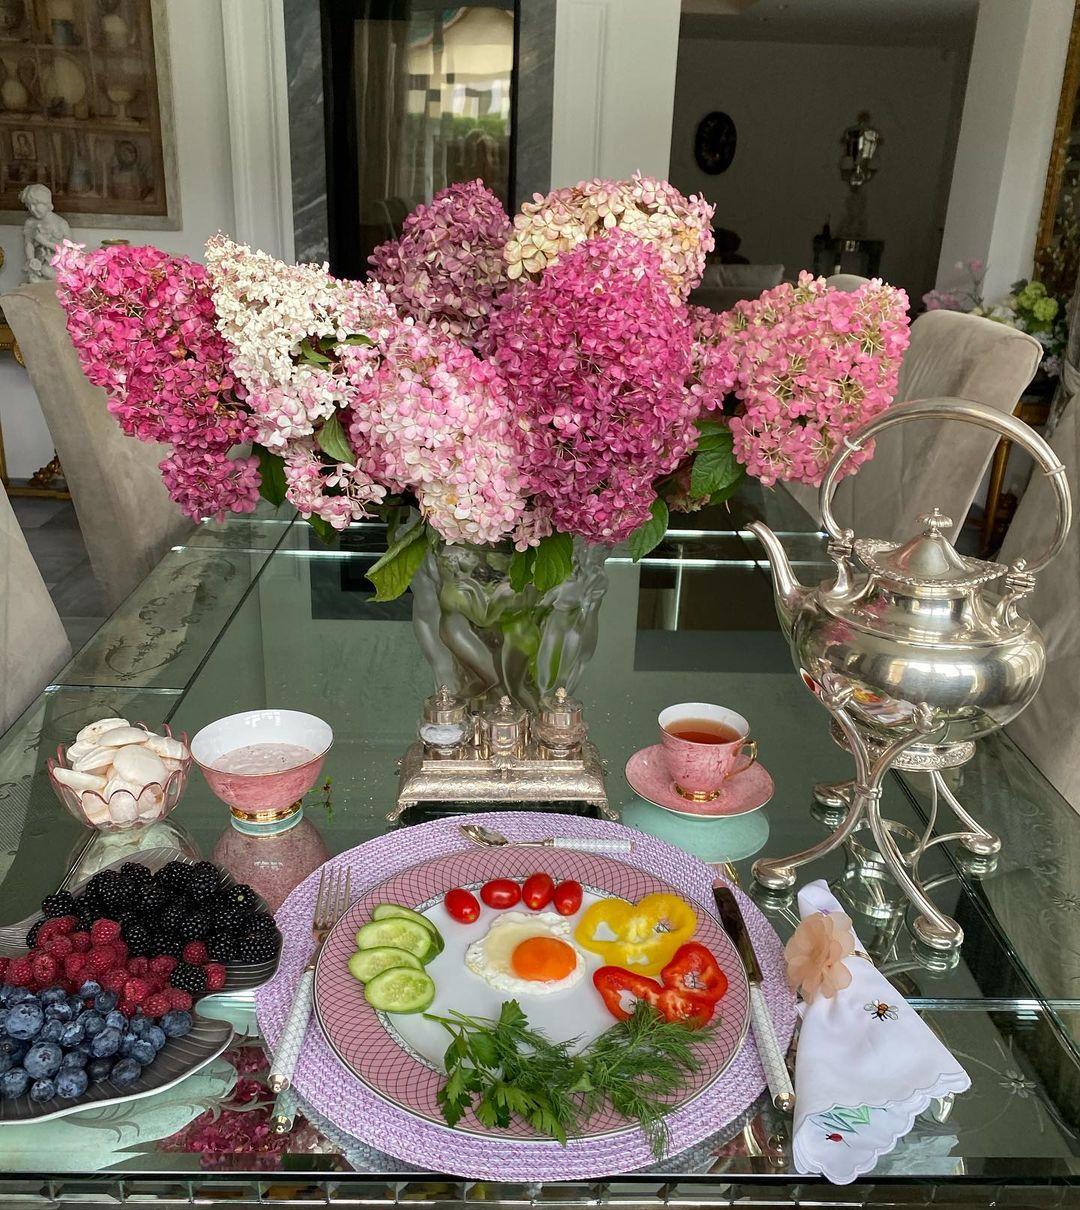 Гортензия, Цветы, Завтраки Яны Рудковской